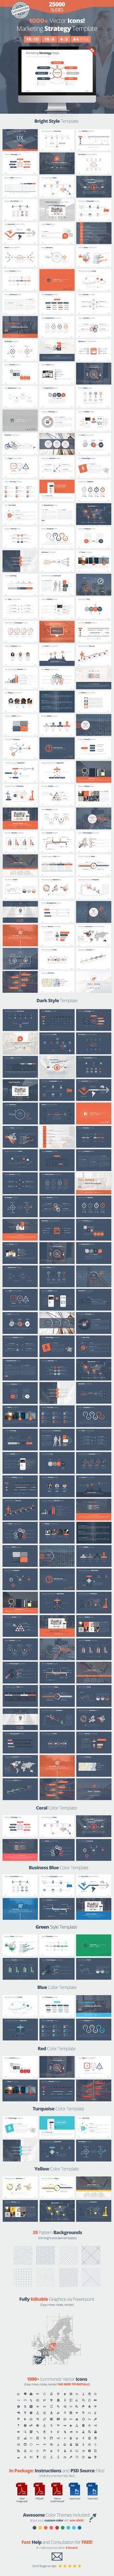 Marketing Strategy Presentation for Keynote Template #design #slides Download: http://graphicriver.net/item/marketing-strategy-presentation-for-keynote/12739940?ref=ksioks